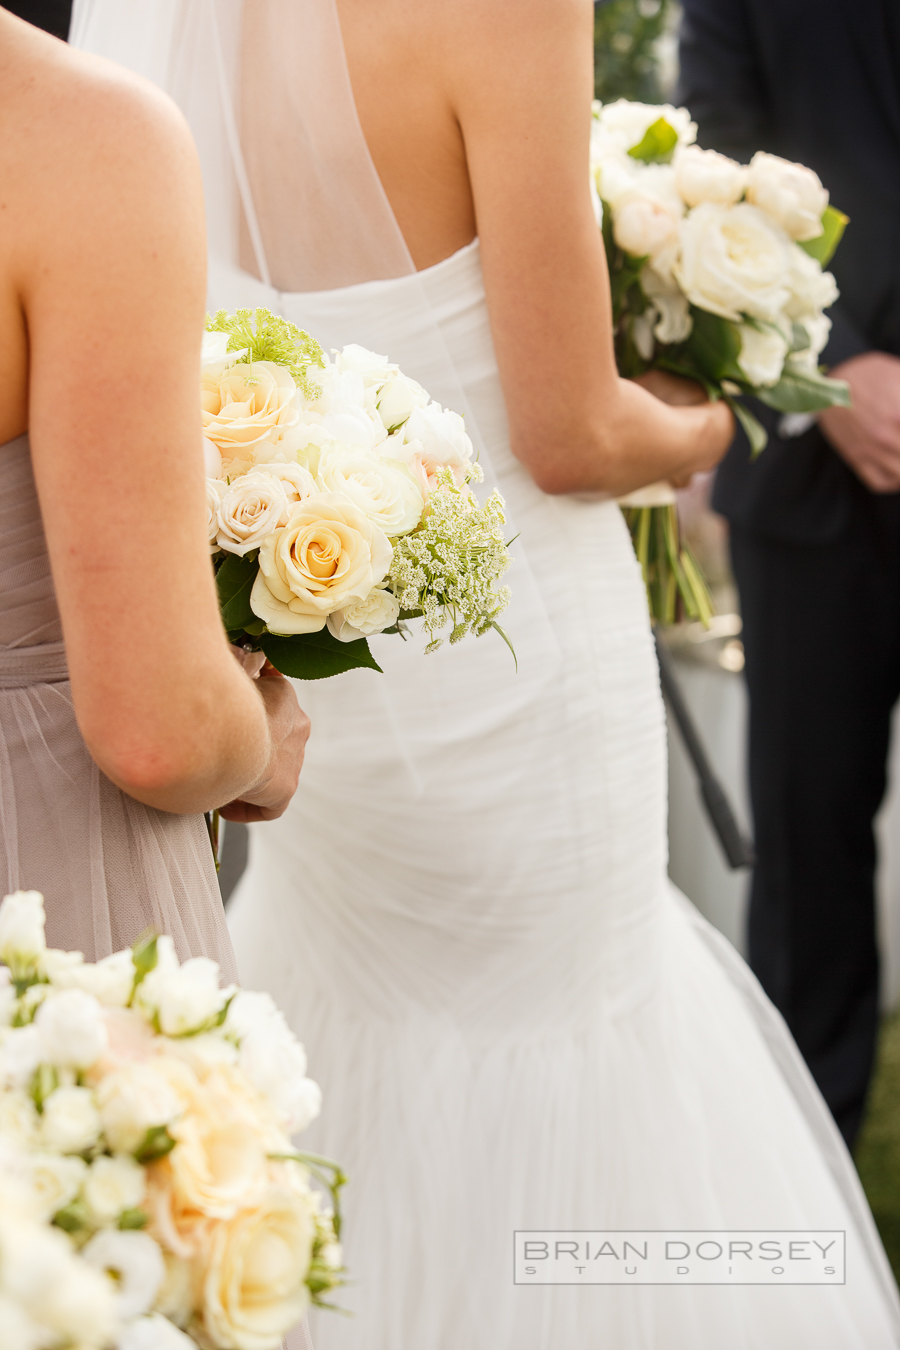 isola nomo soho hotel wedding brian dorsey studios ang weddings and events-20.jpg